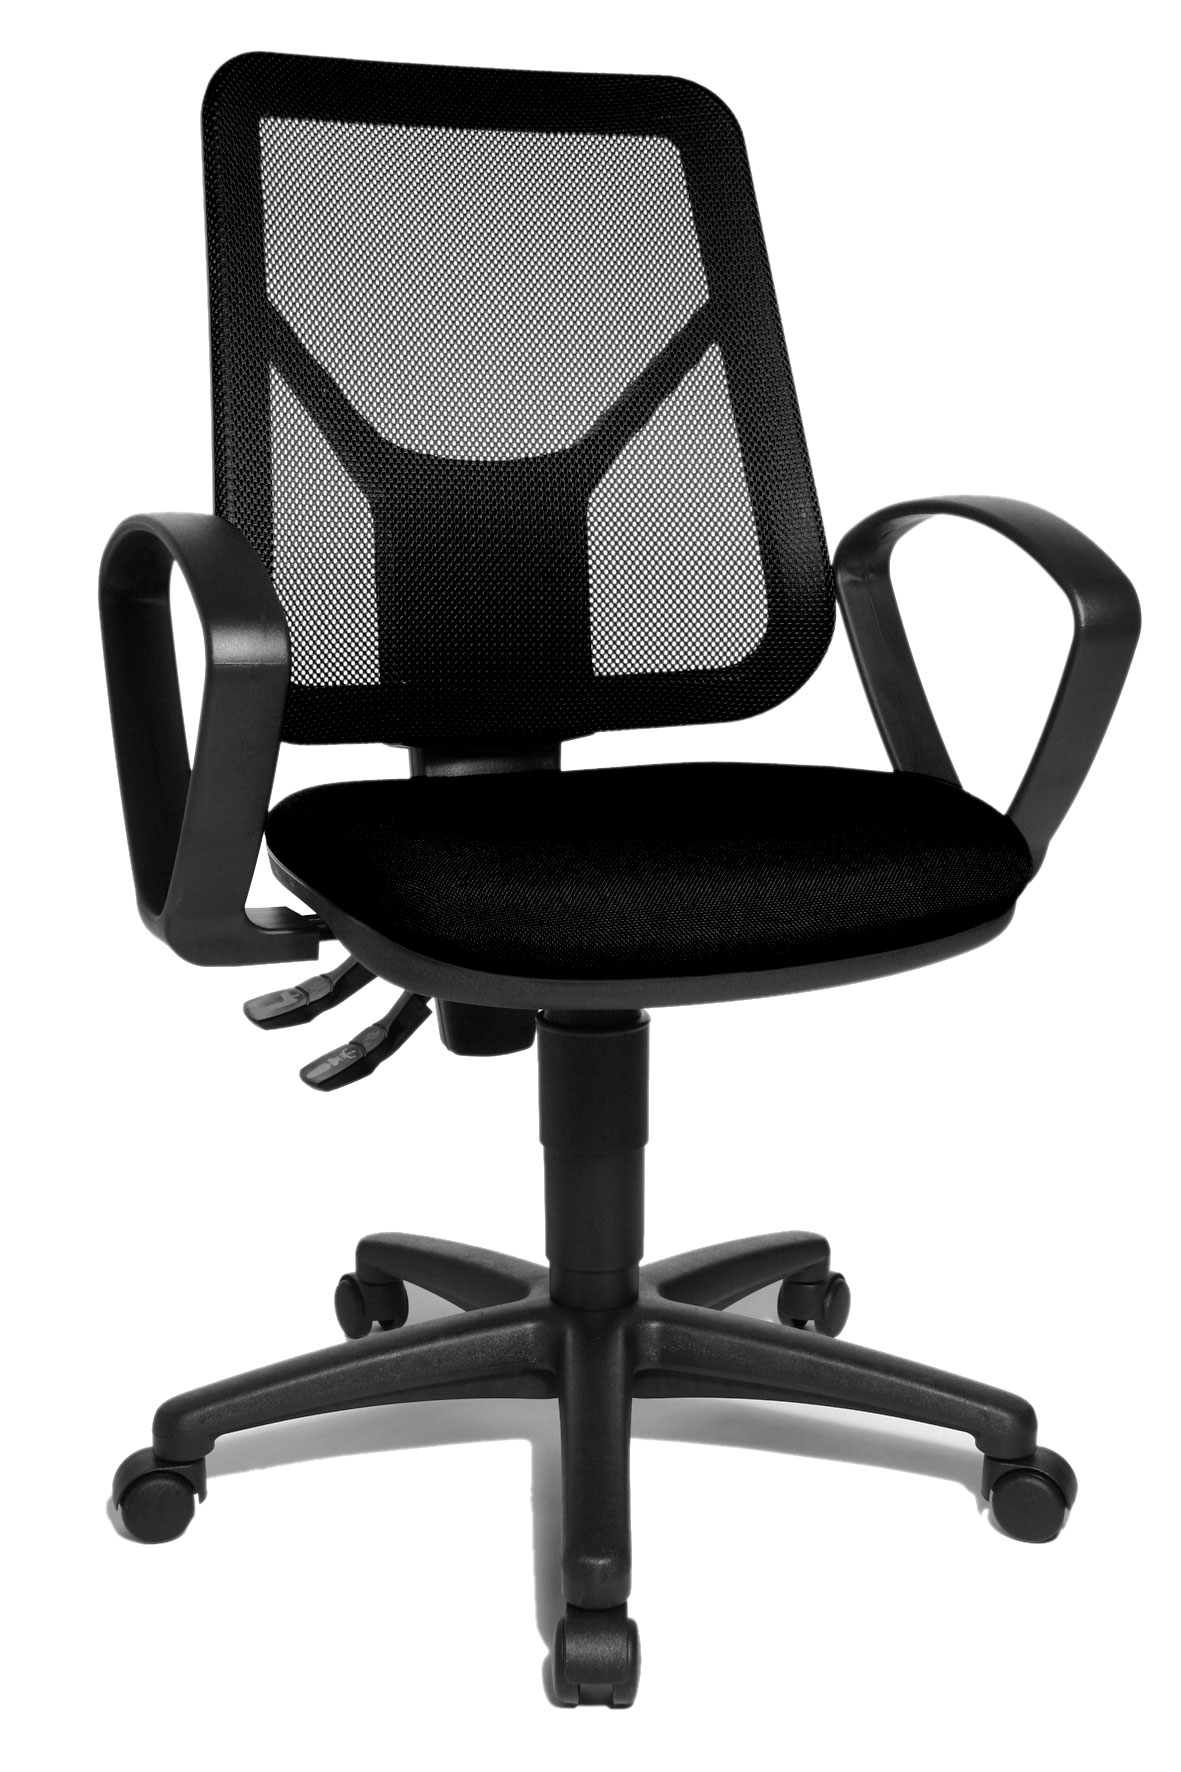 Chaise de bureau contemporaine en tissu noir Zumba